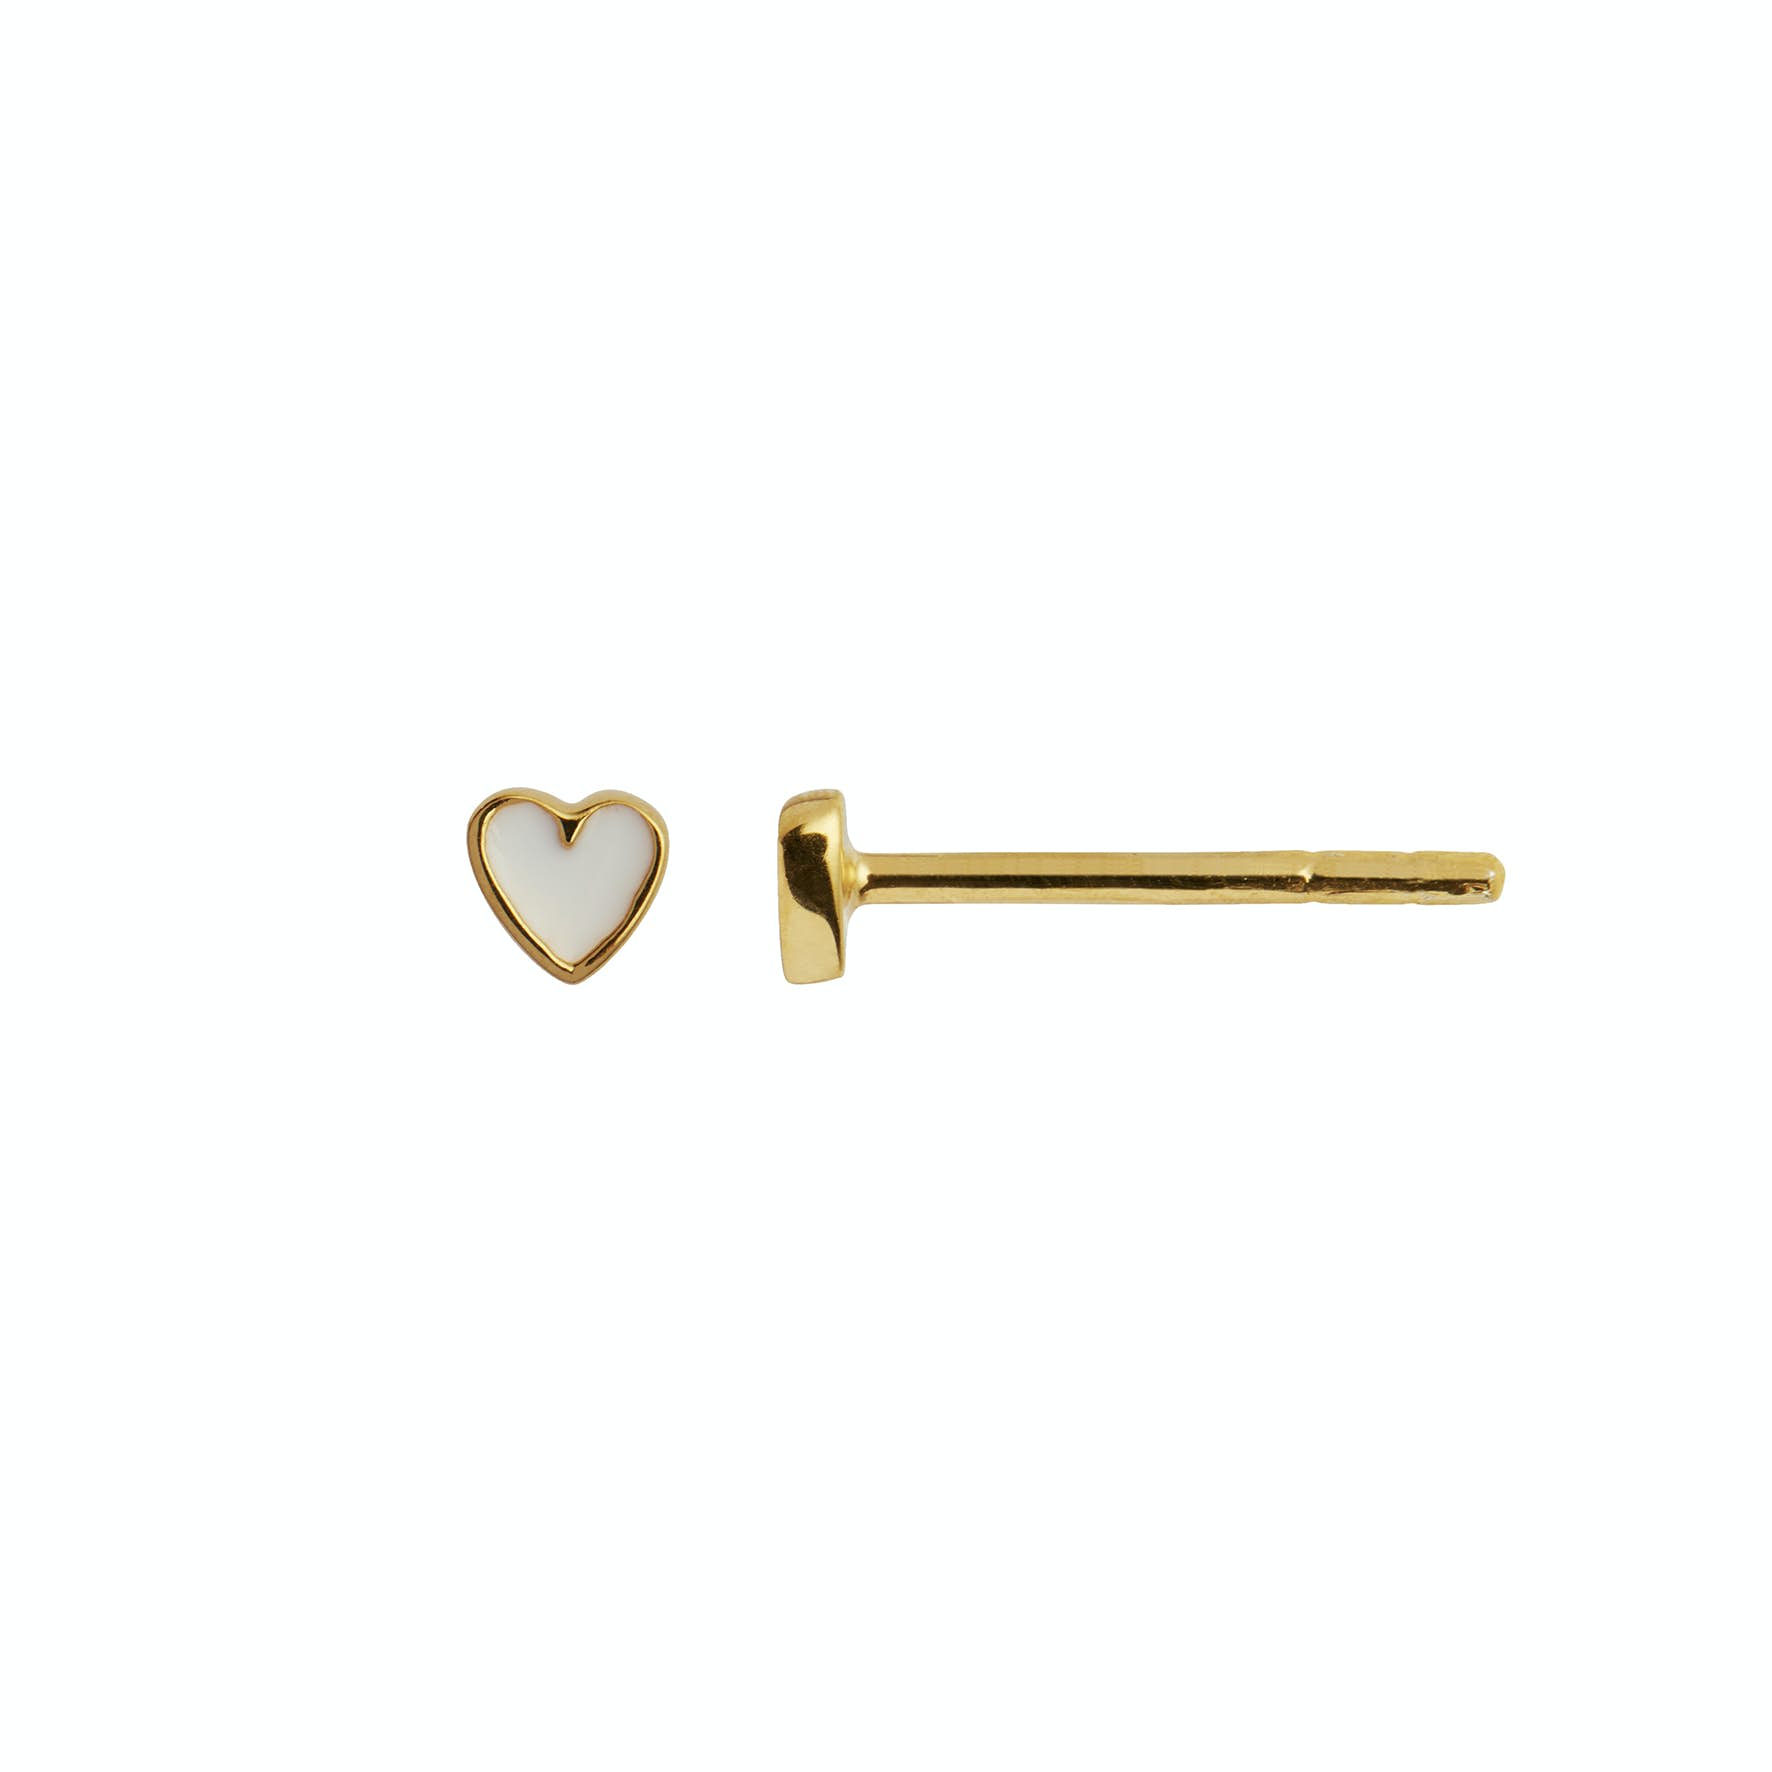 Petit Love Heart Earstick White von STINE A Jewelry in Vergoldet-Silber Sterling 925